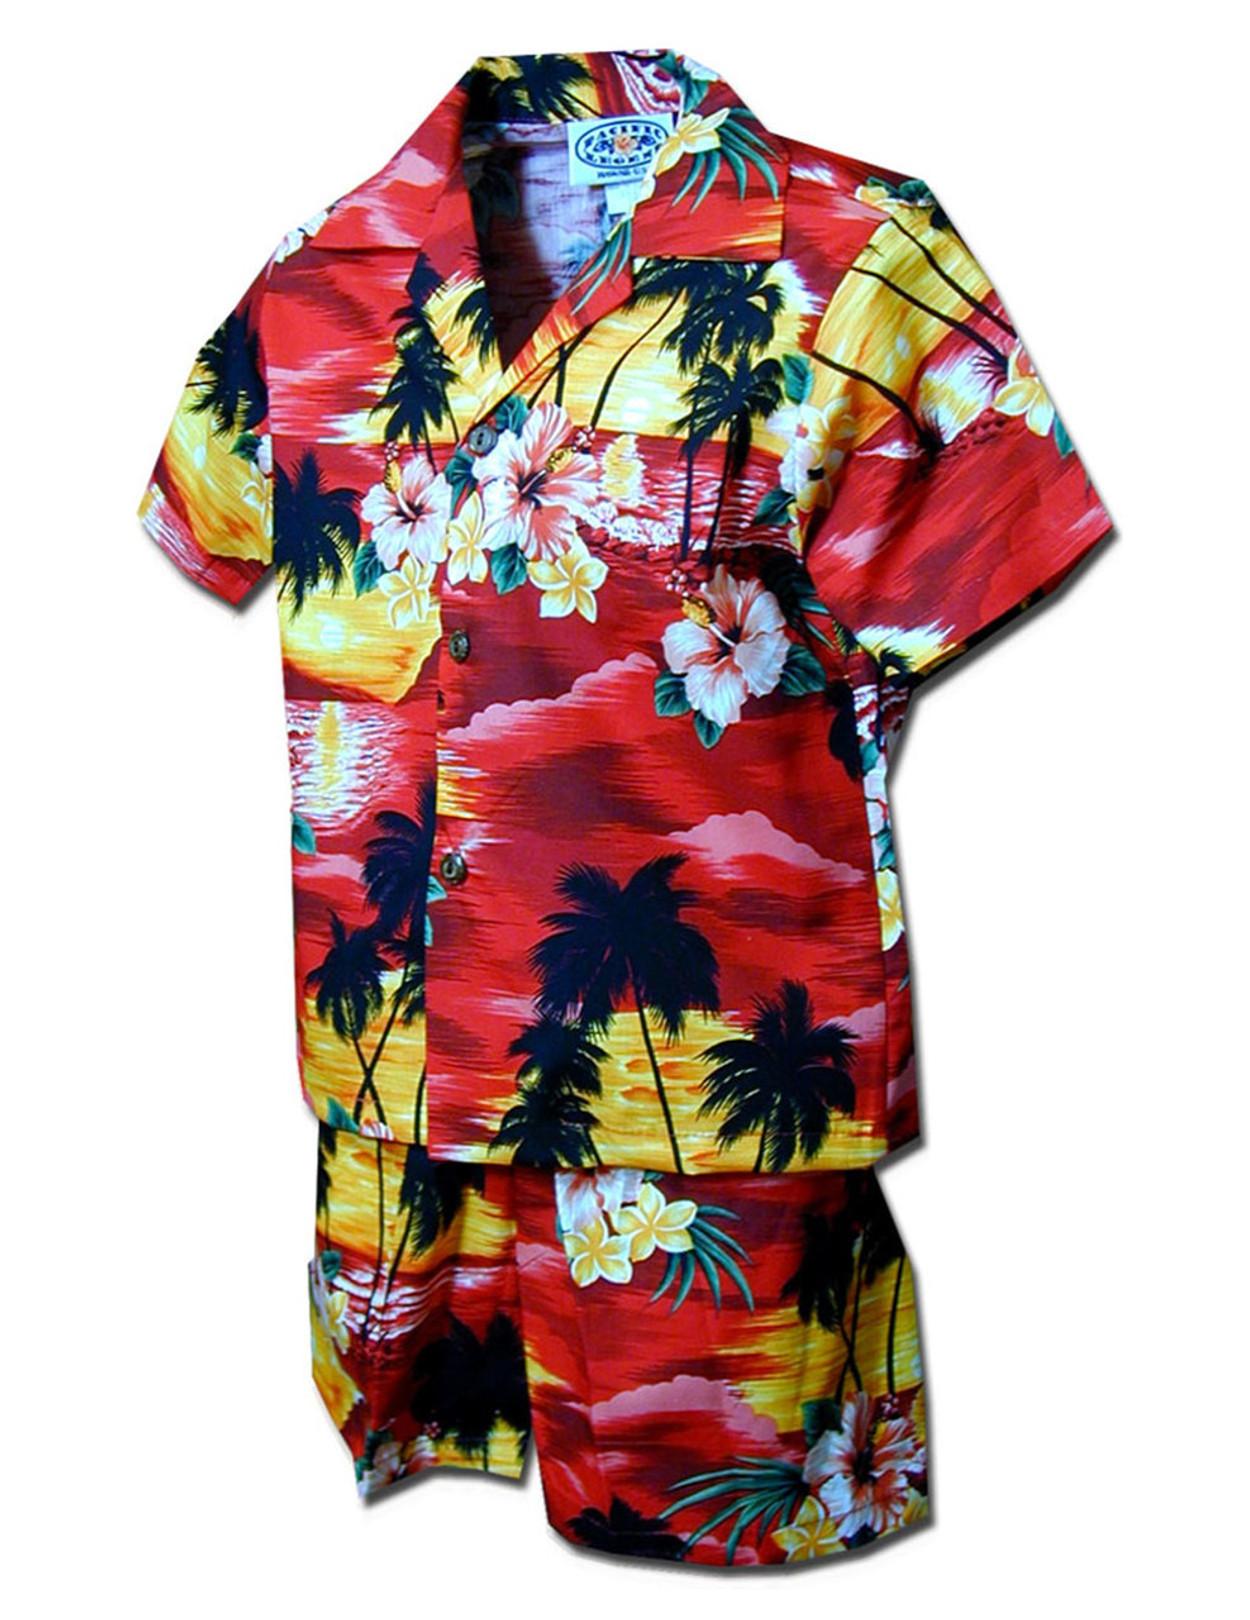 af7cea9dbfa4a Toddler Clothes Set Sunset Hawaiian Islands 100% Cotton Fabric Matching  Shorts and Shirt Set Coconut